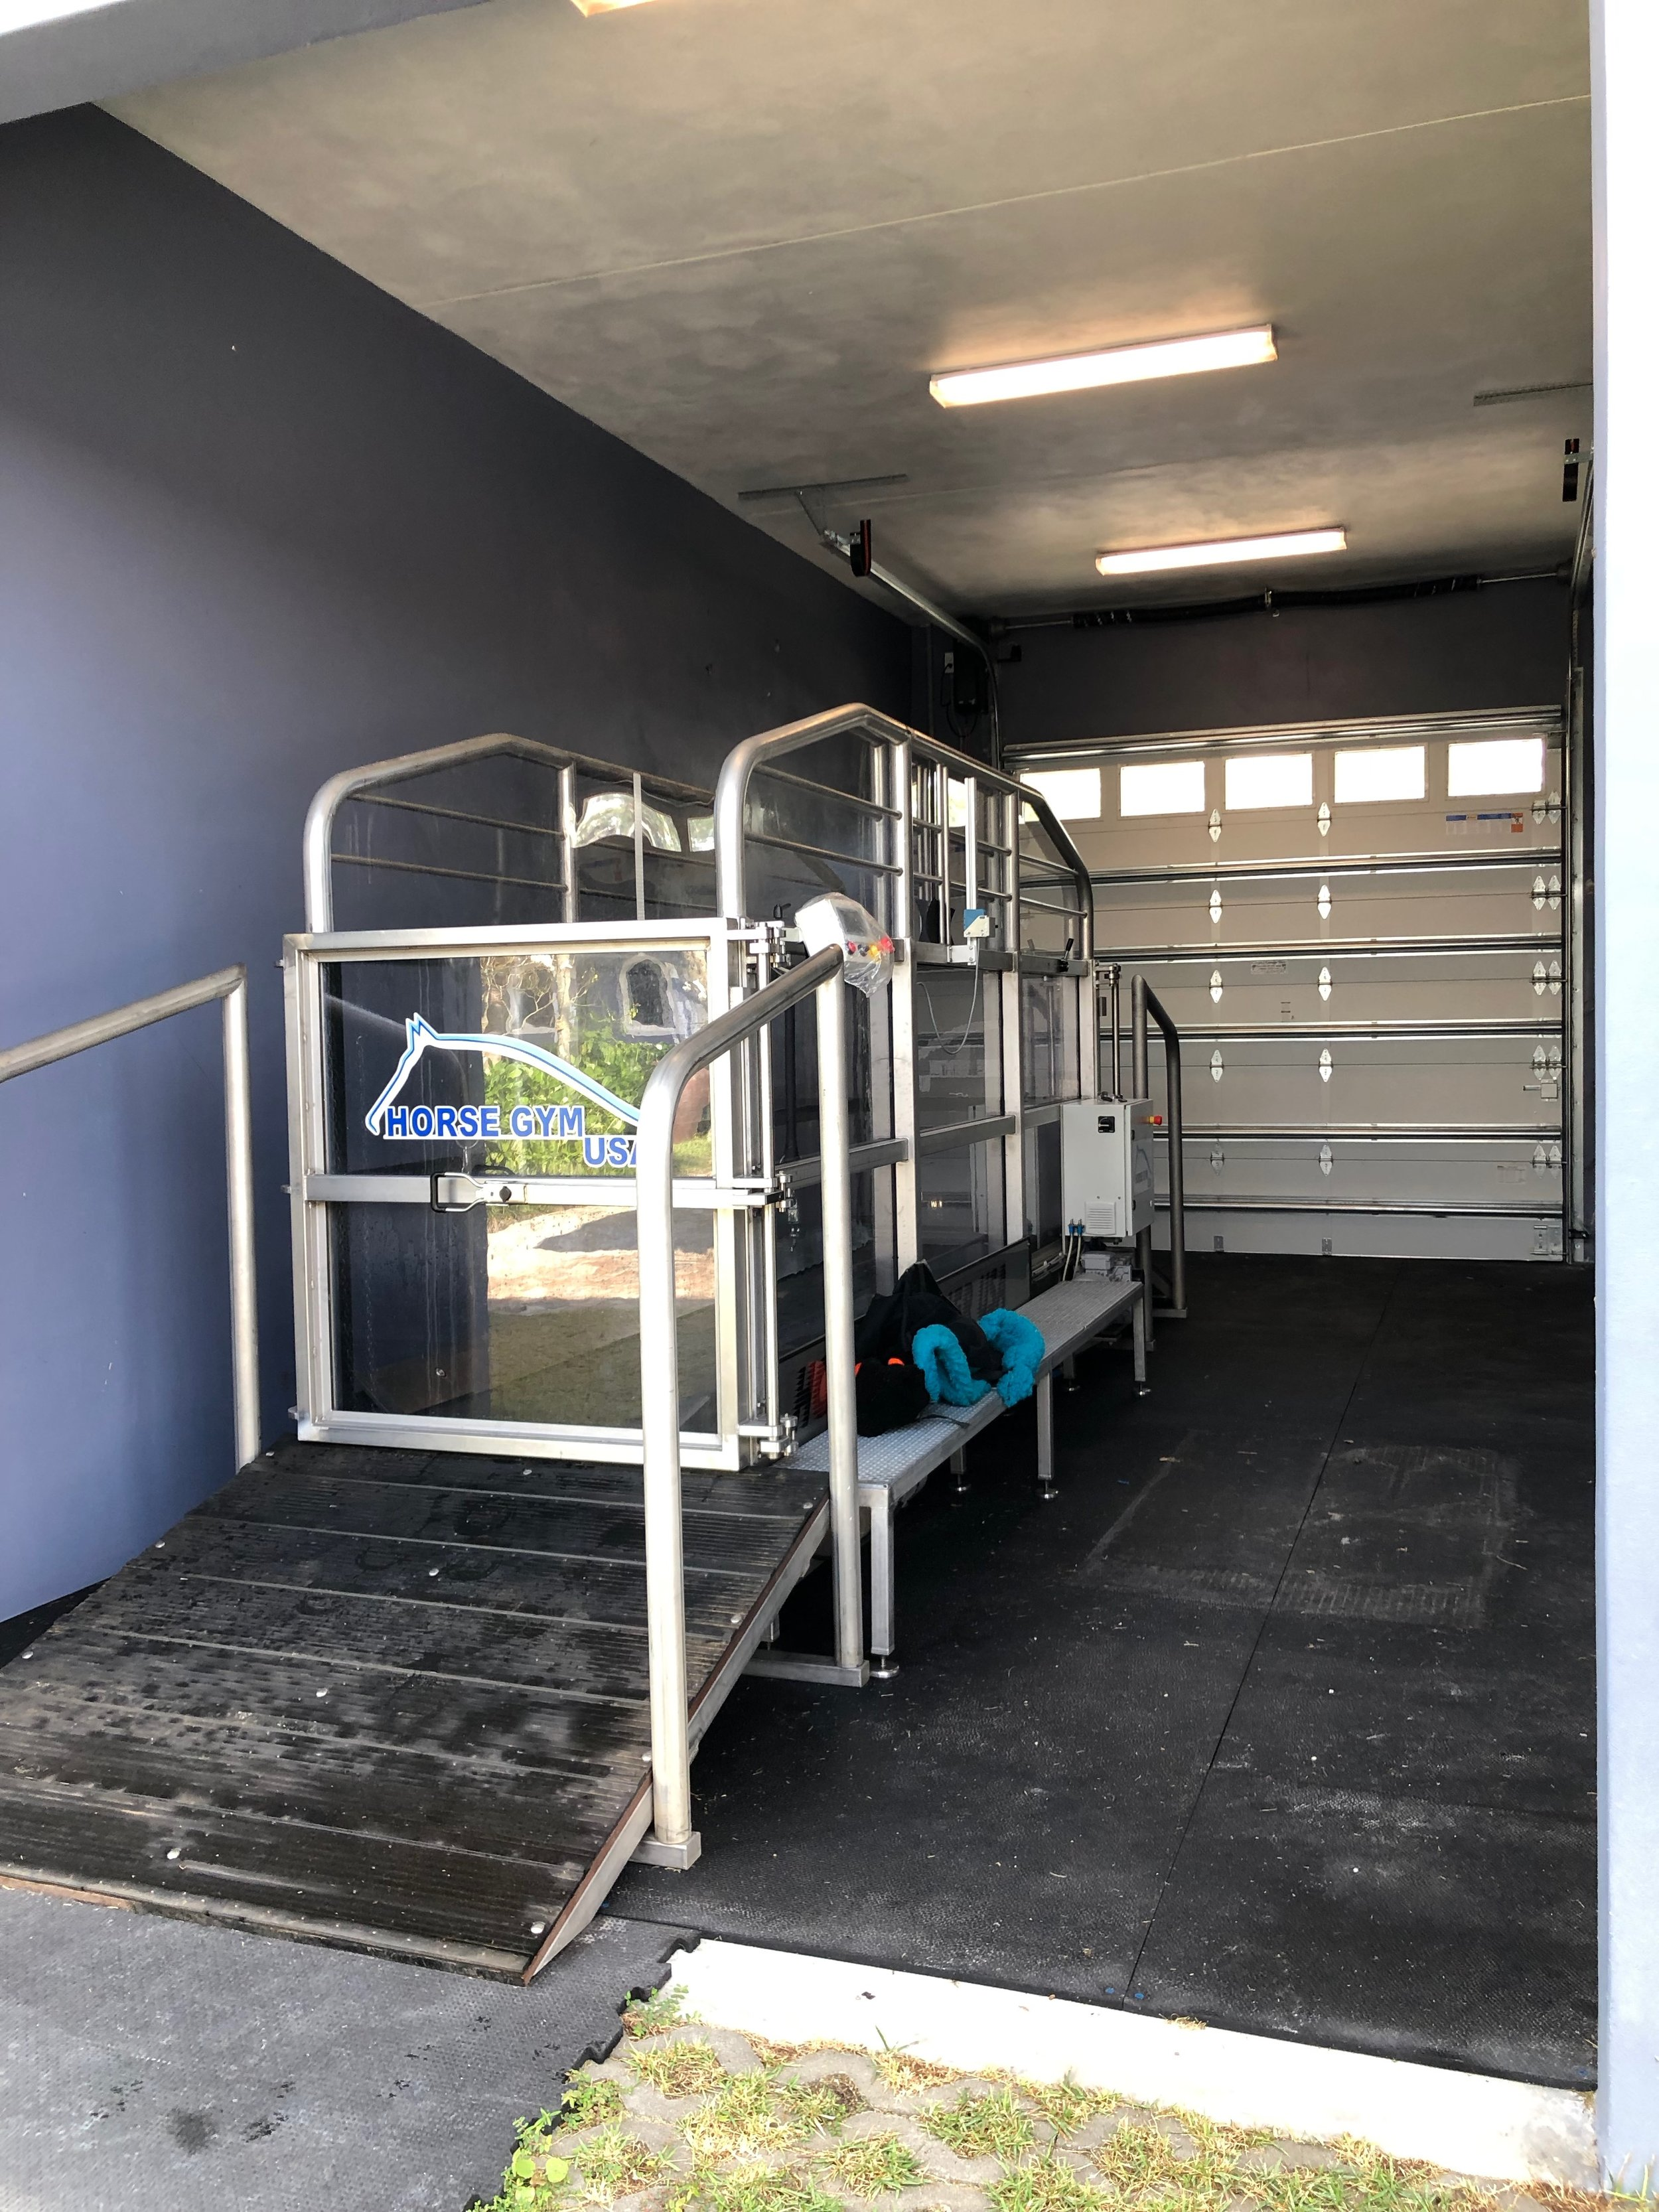 Horse Gym Usa - Aqua Trainer located at Fair Sky Farm in Loxahatchee, FL